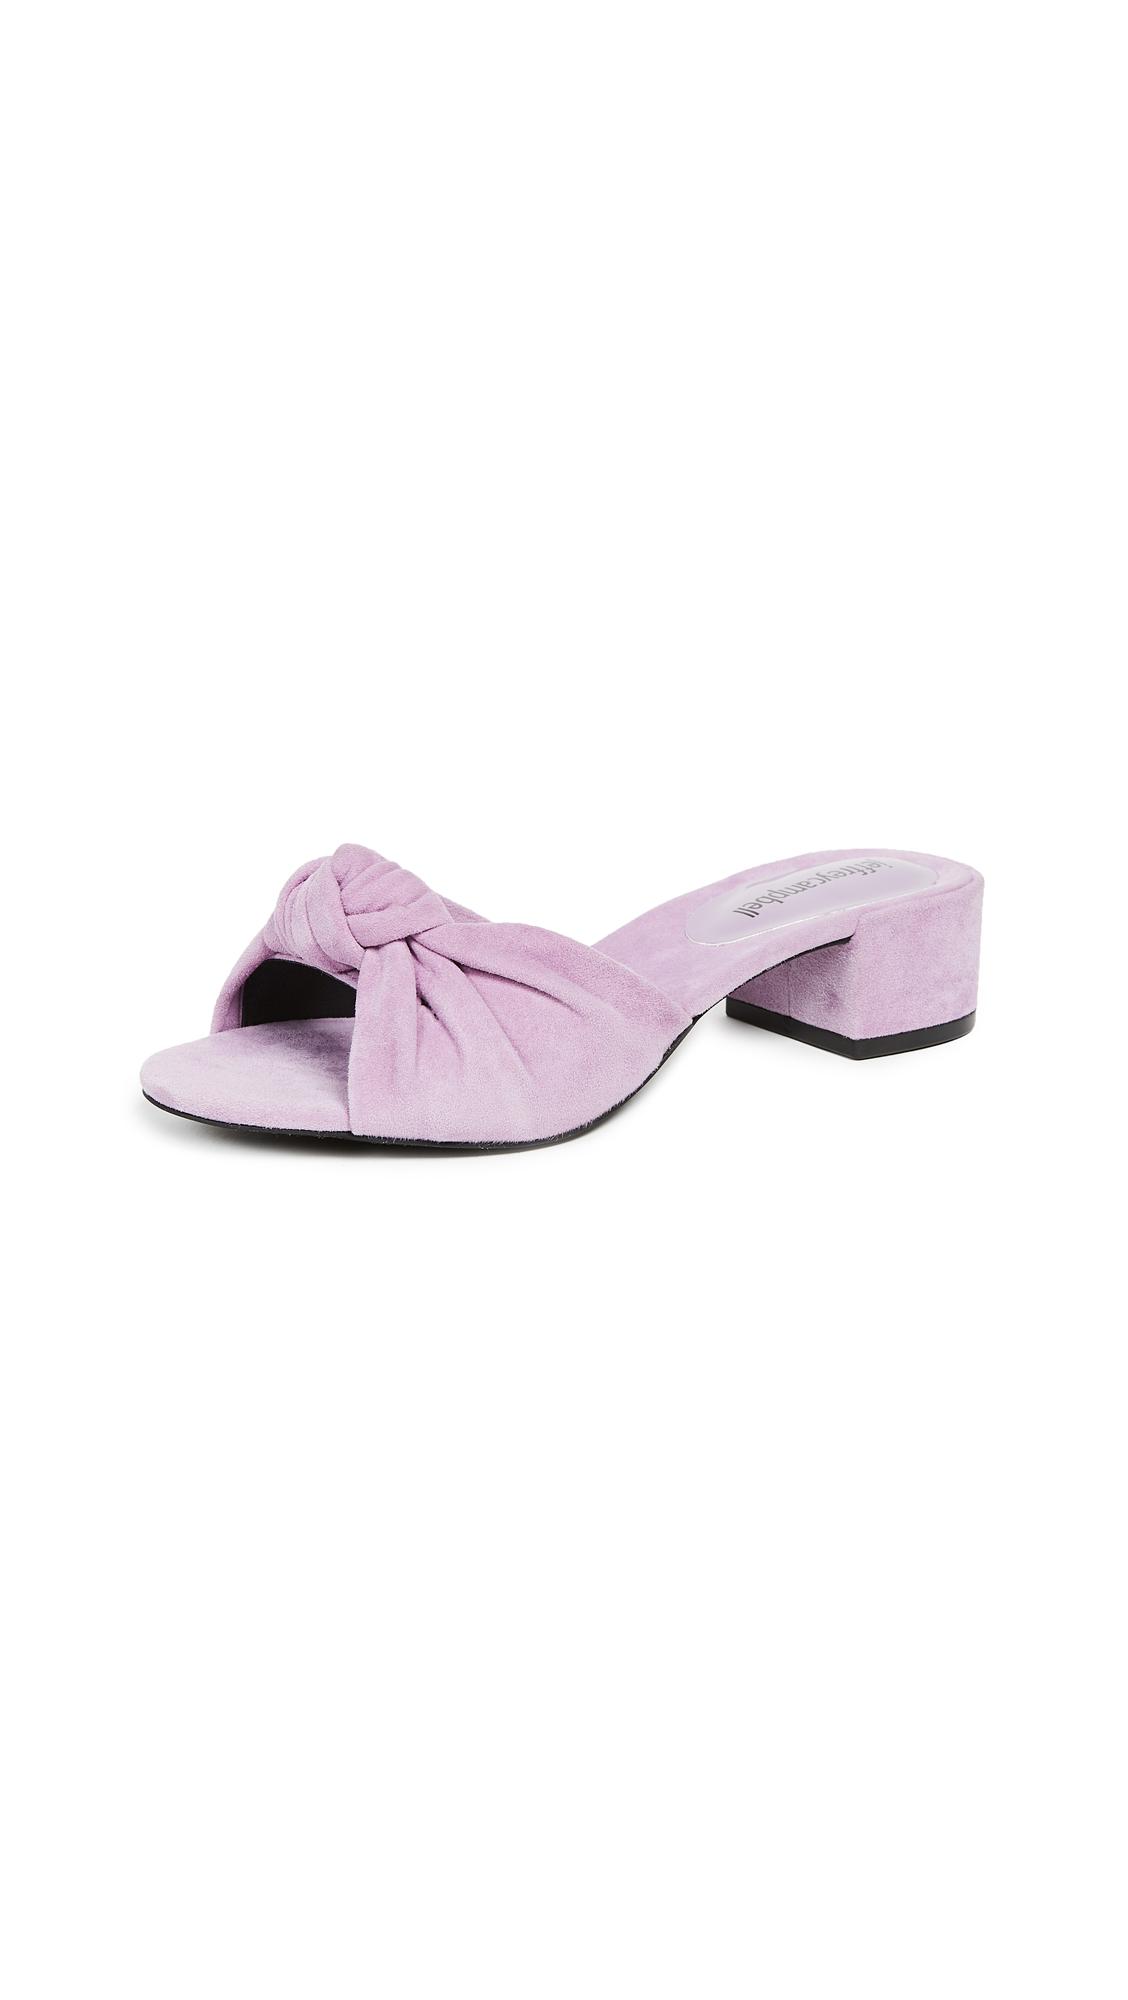 Jeffrey Campbell Beaton Slides - Lilac